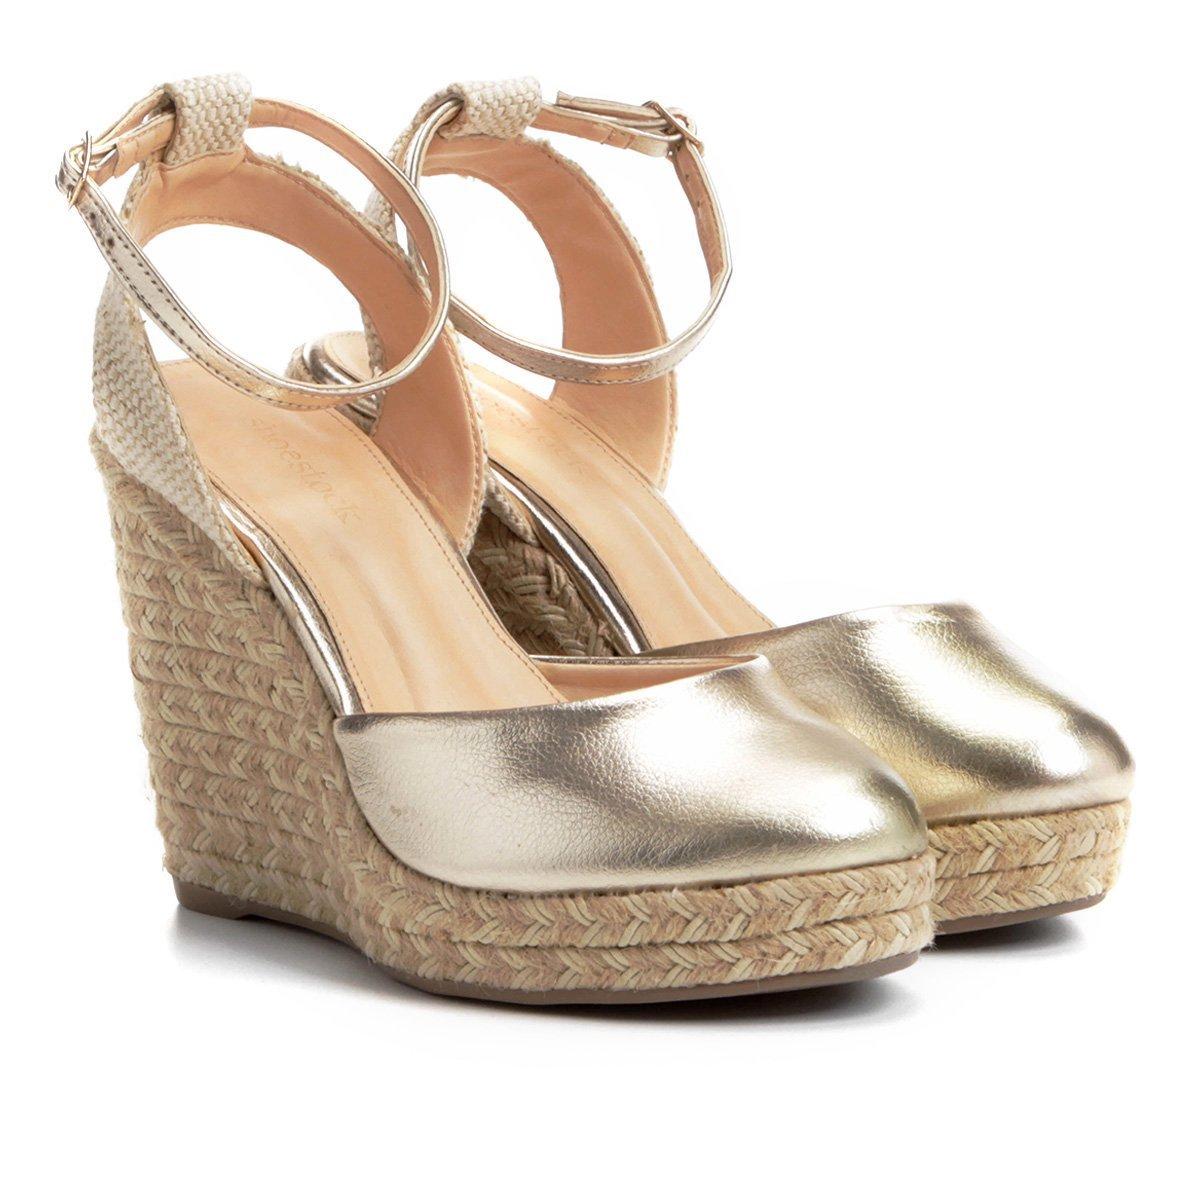 19a78bf404 Sandália Anabela Shoestock Espadrille Corda Feminina